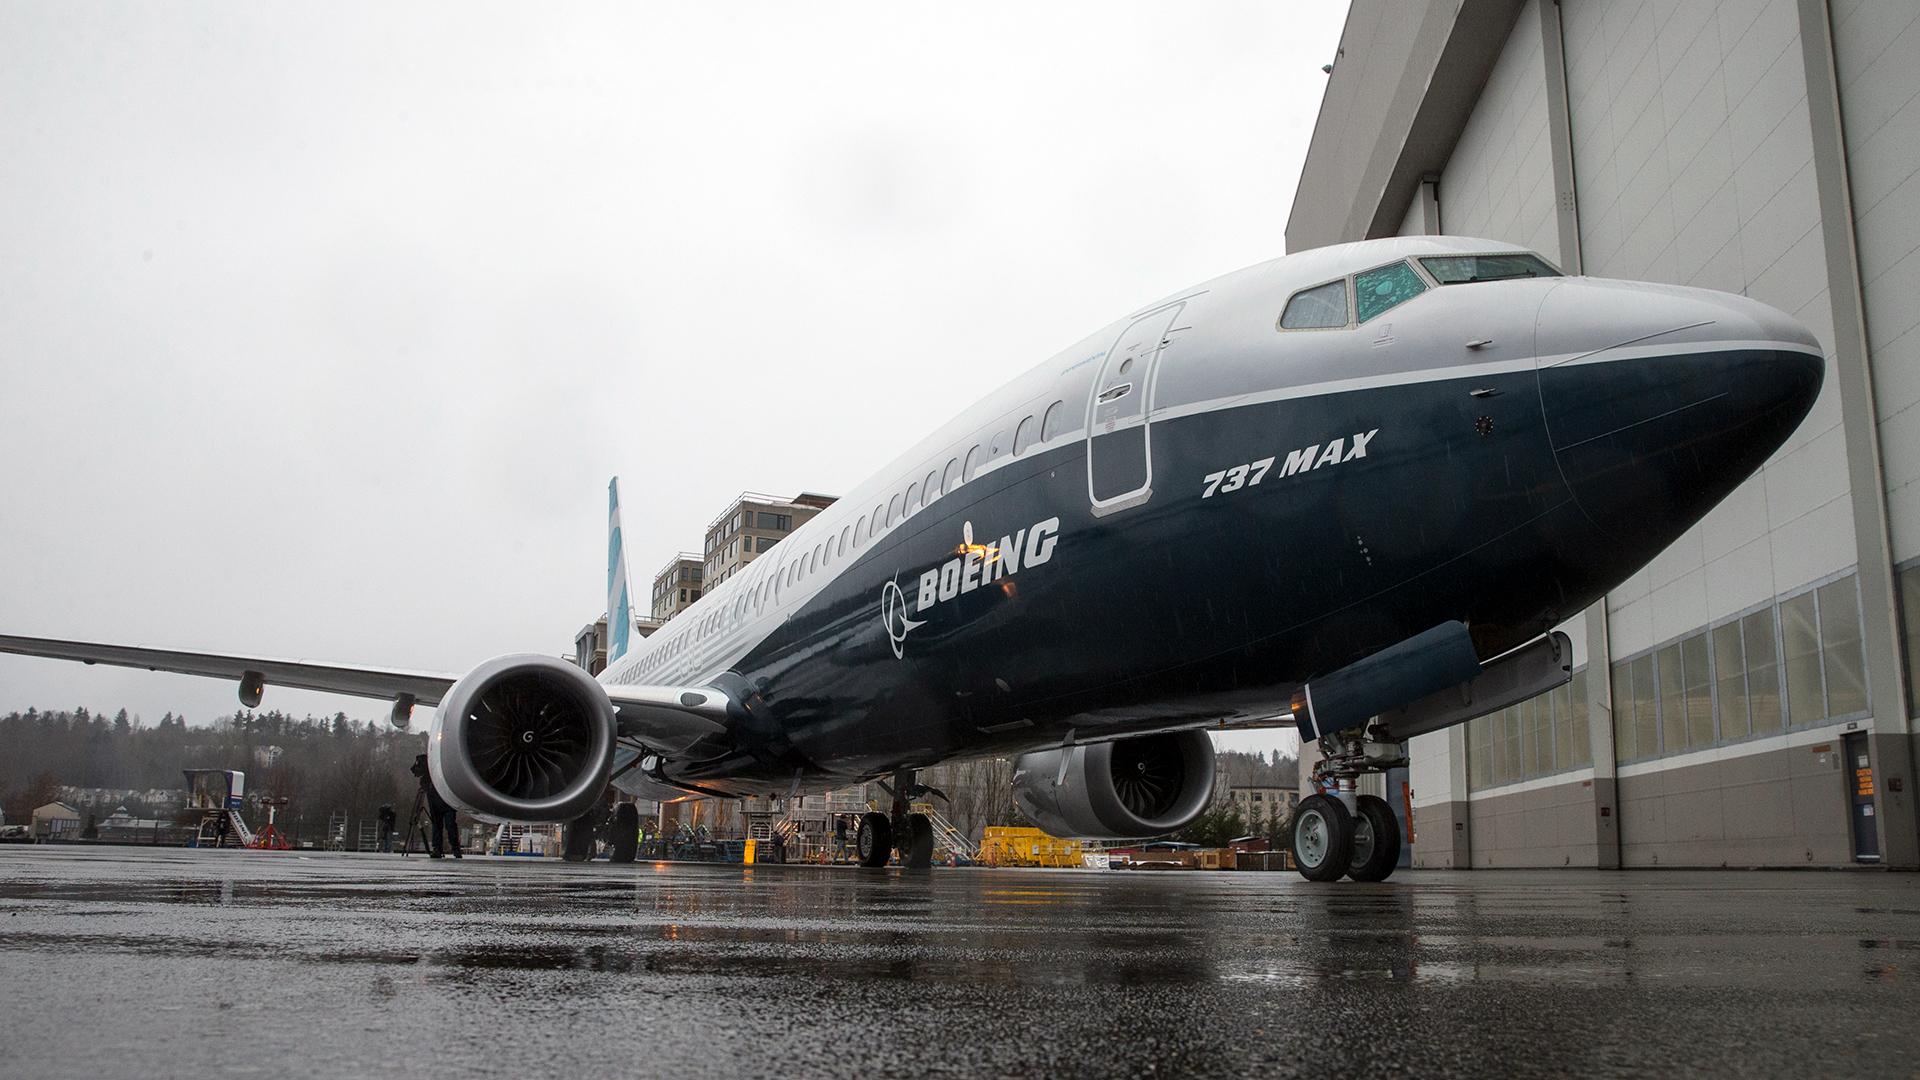 Boeing 737 Max airplane-159532.jpg41409916